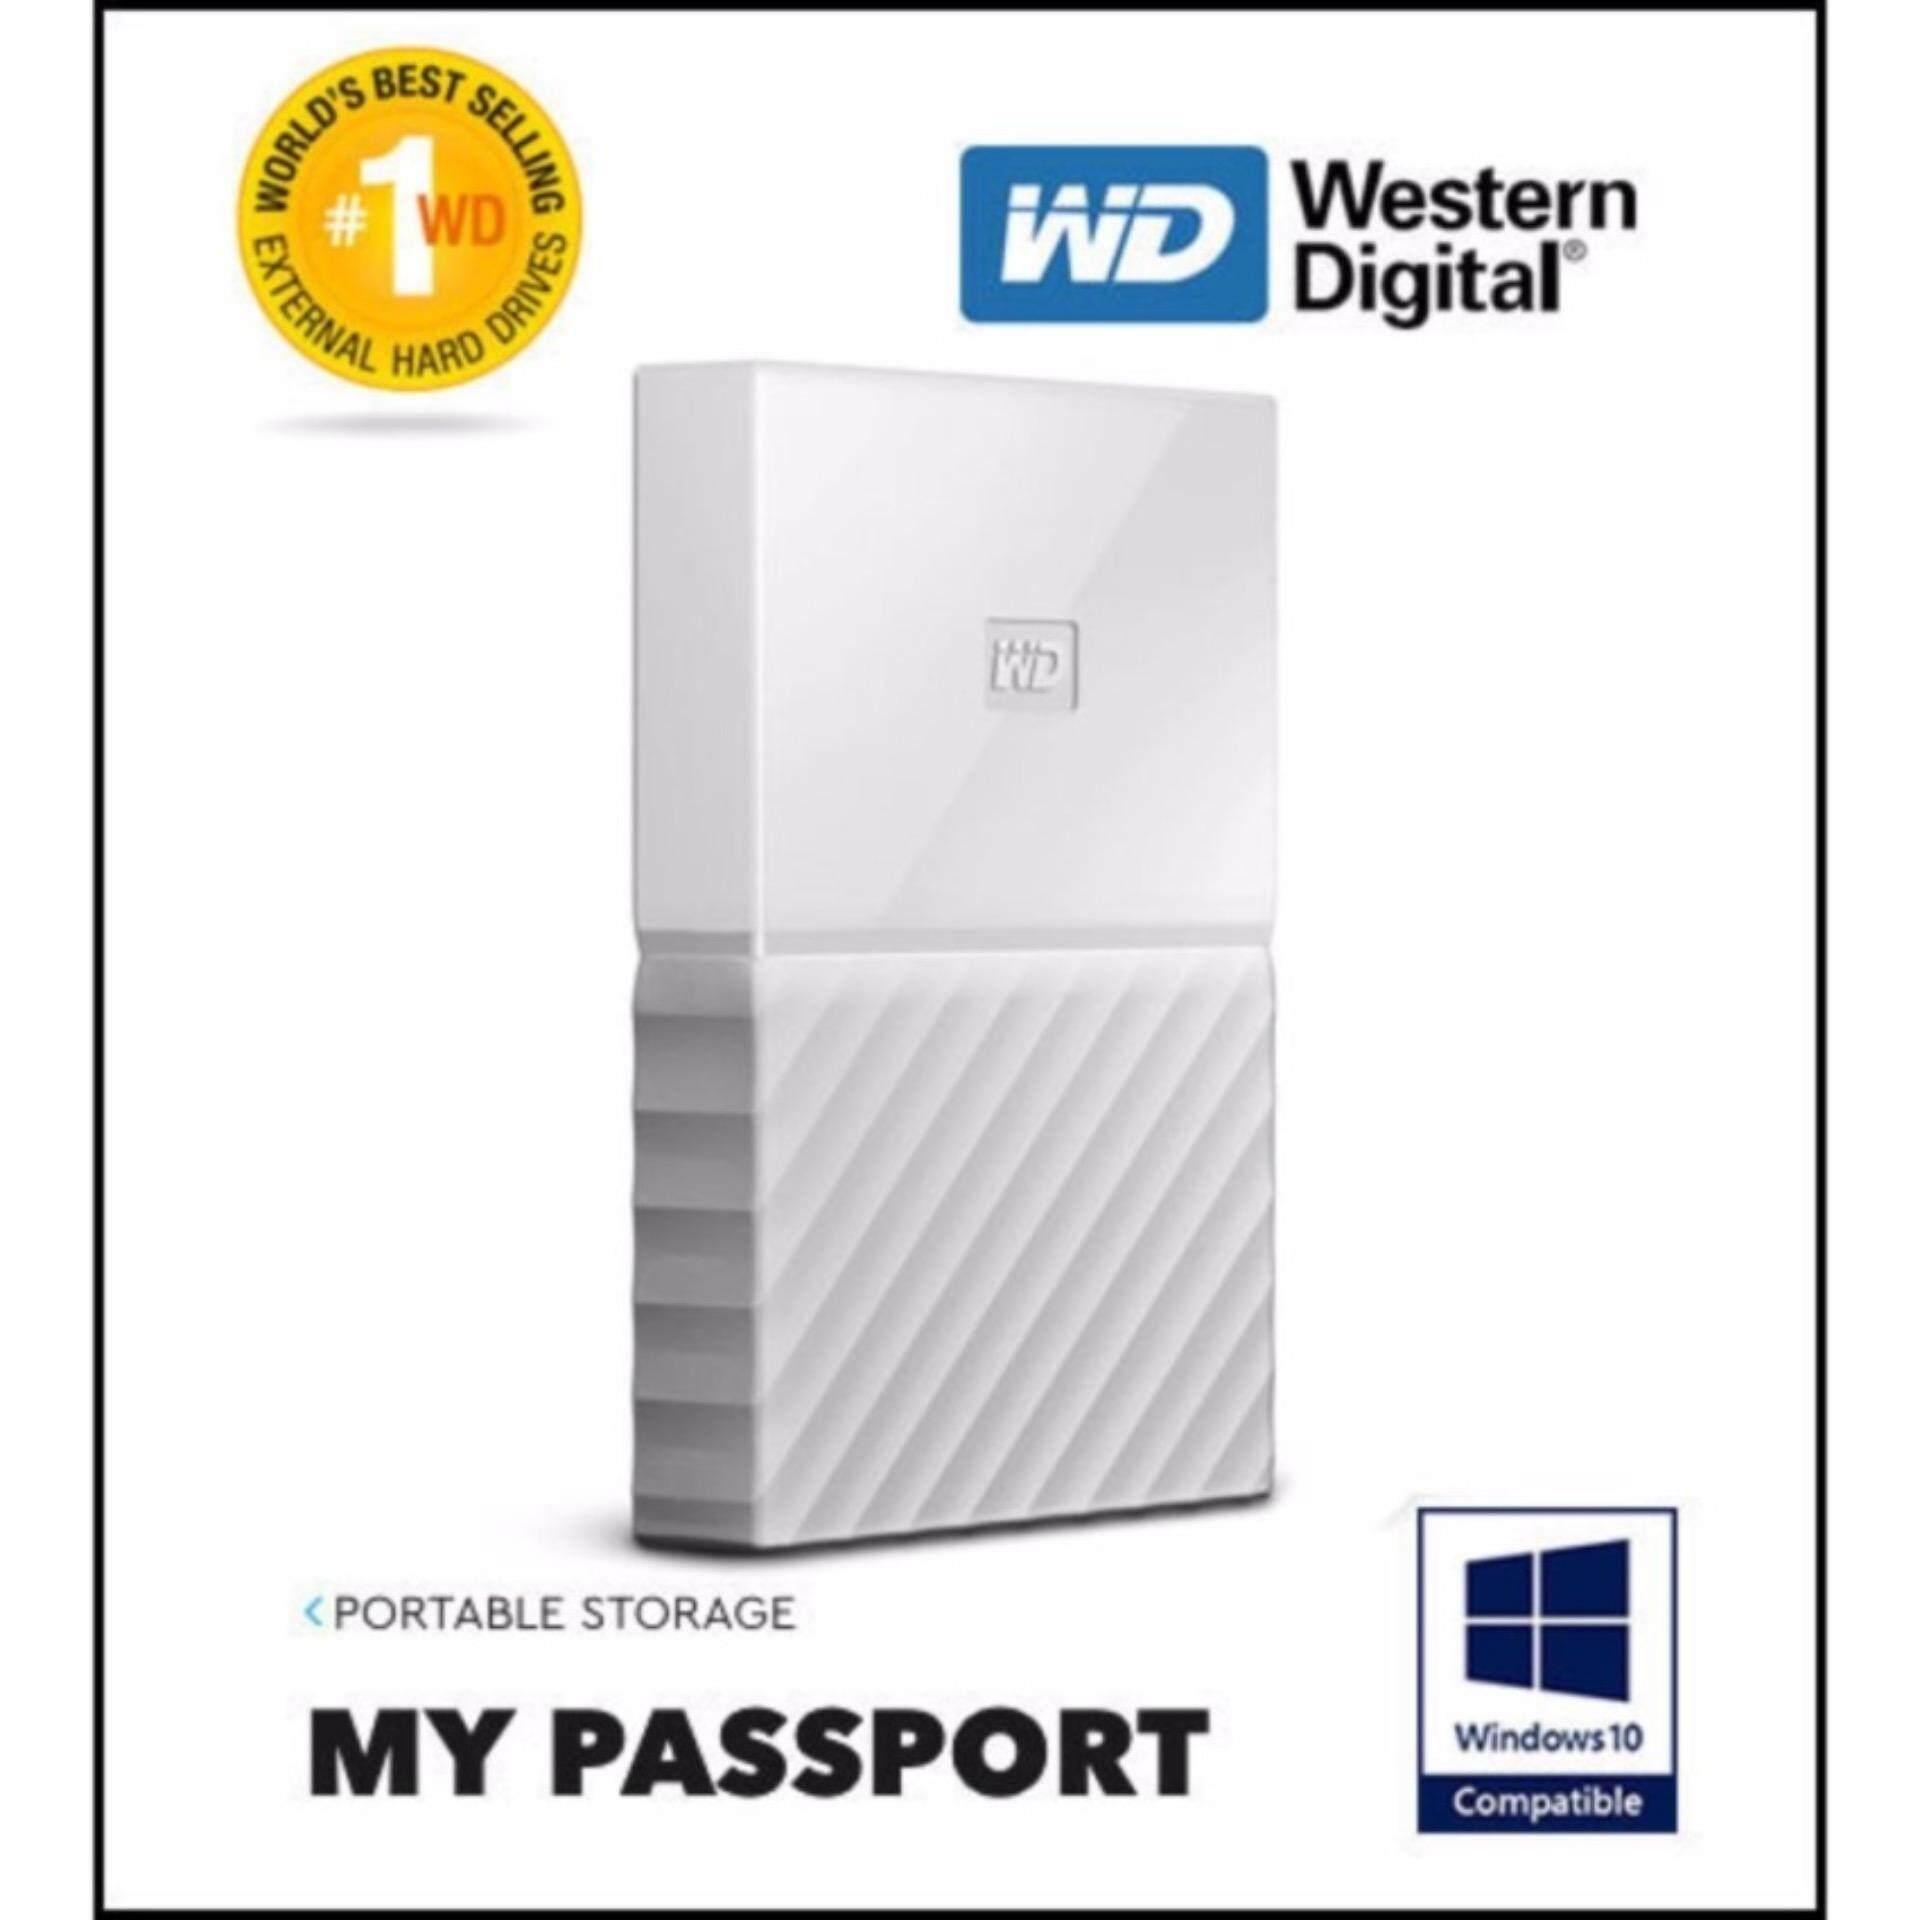 Wd Western Digital Hdd My Passport 1tb Portable Storage External Hardisk Elements Hard Disk Drive White Malaysia